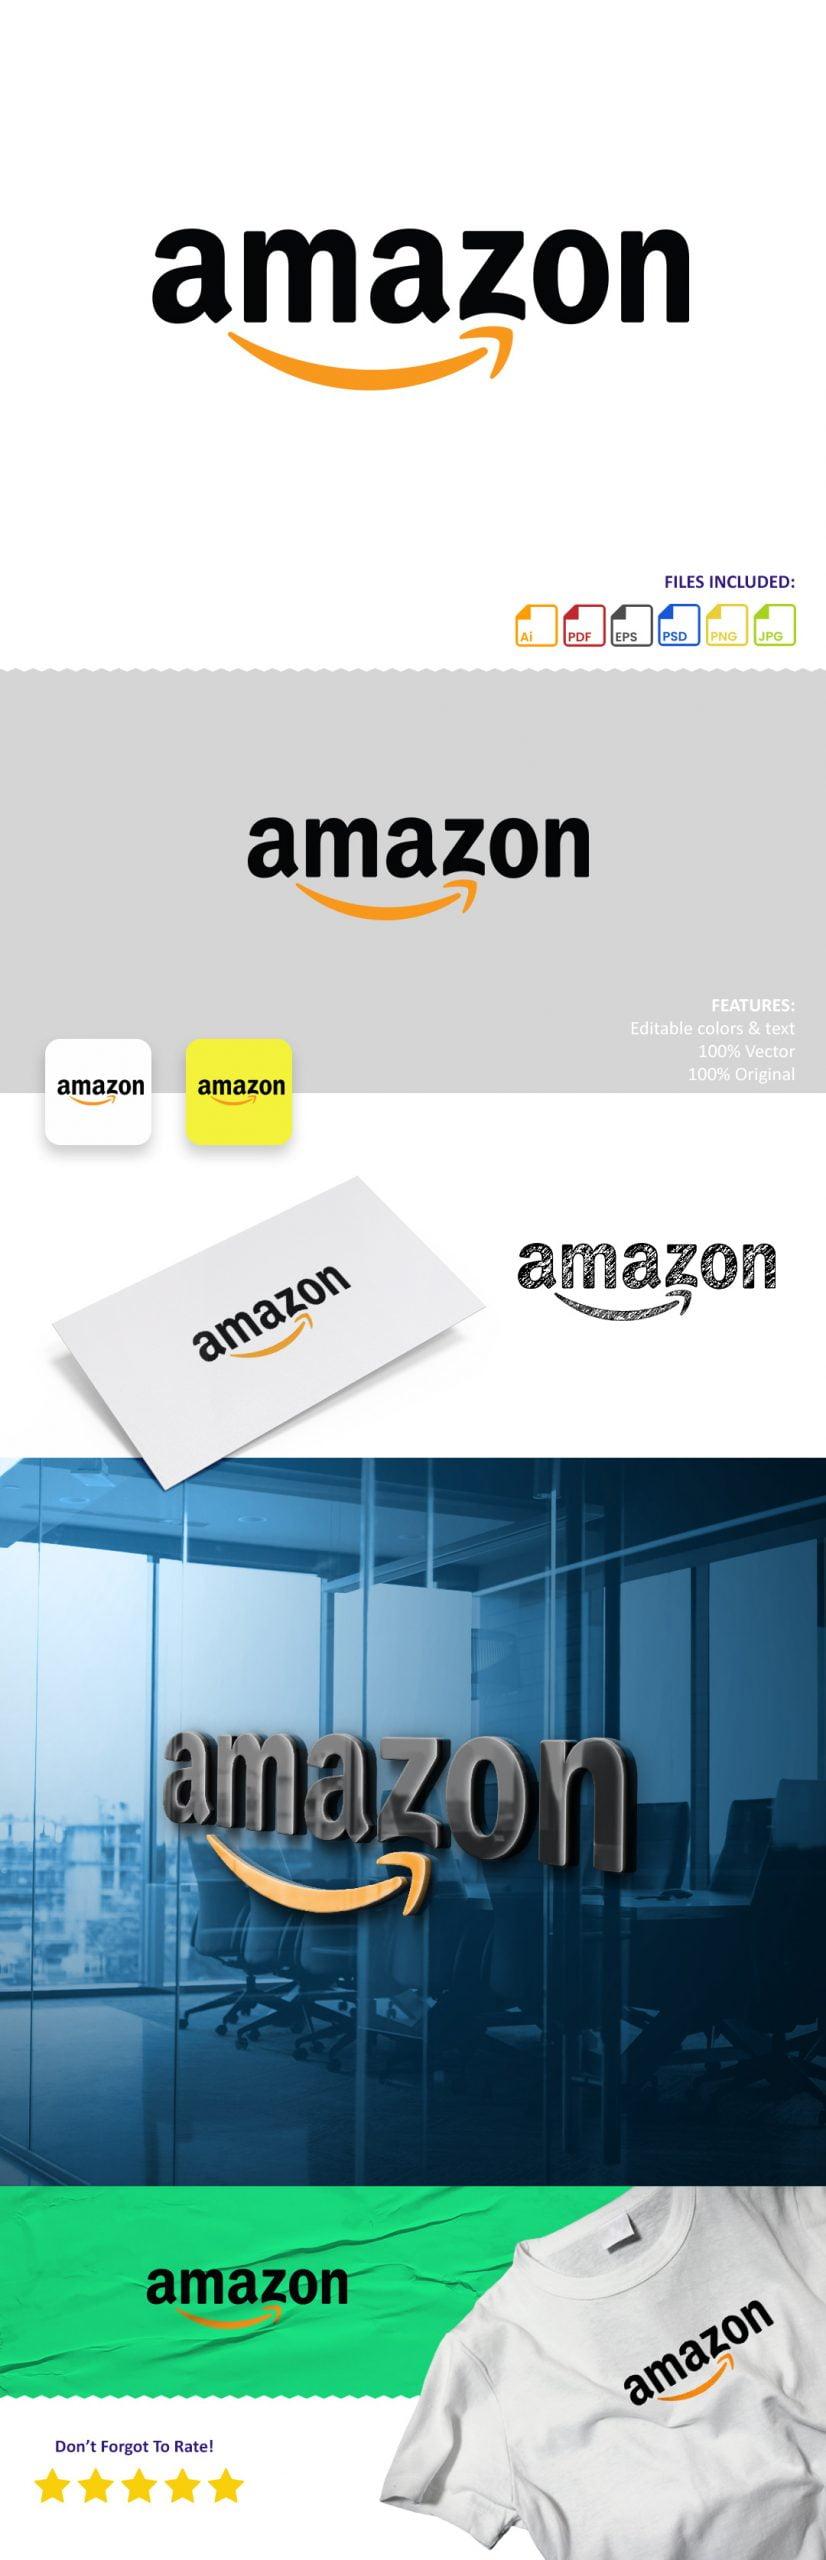 Download Best Logo Preview Image Generator